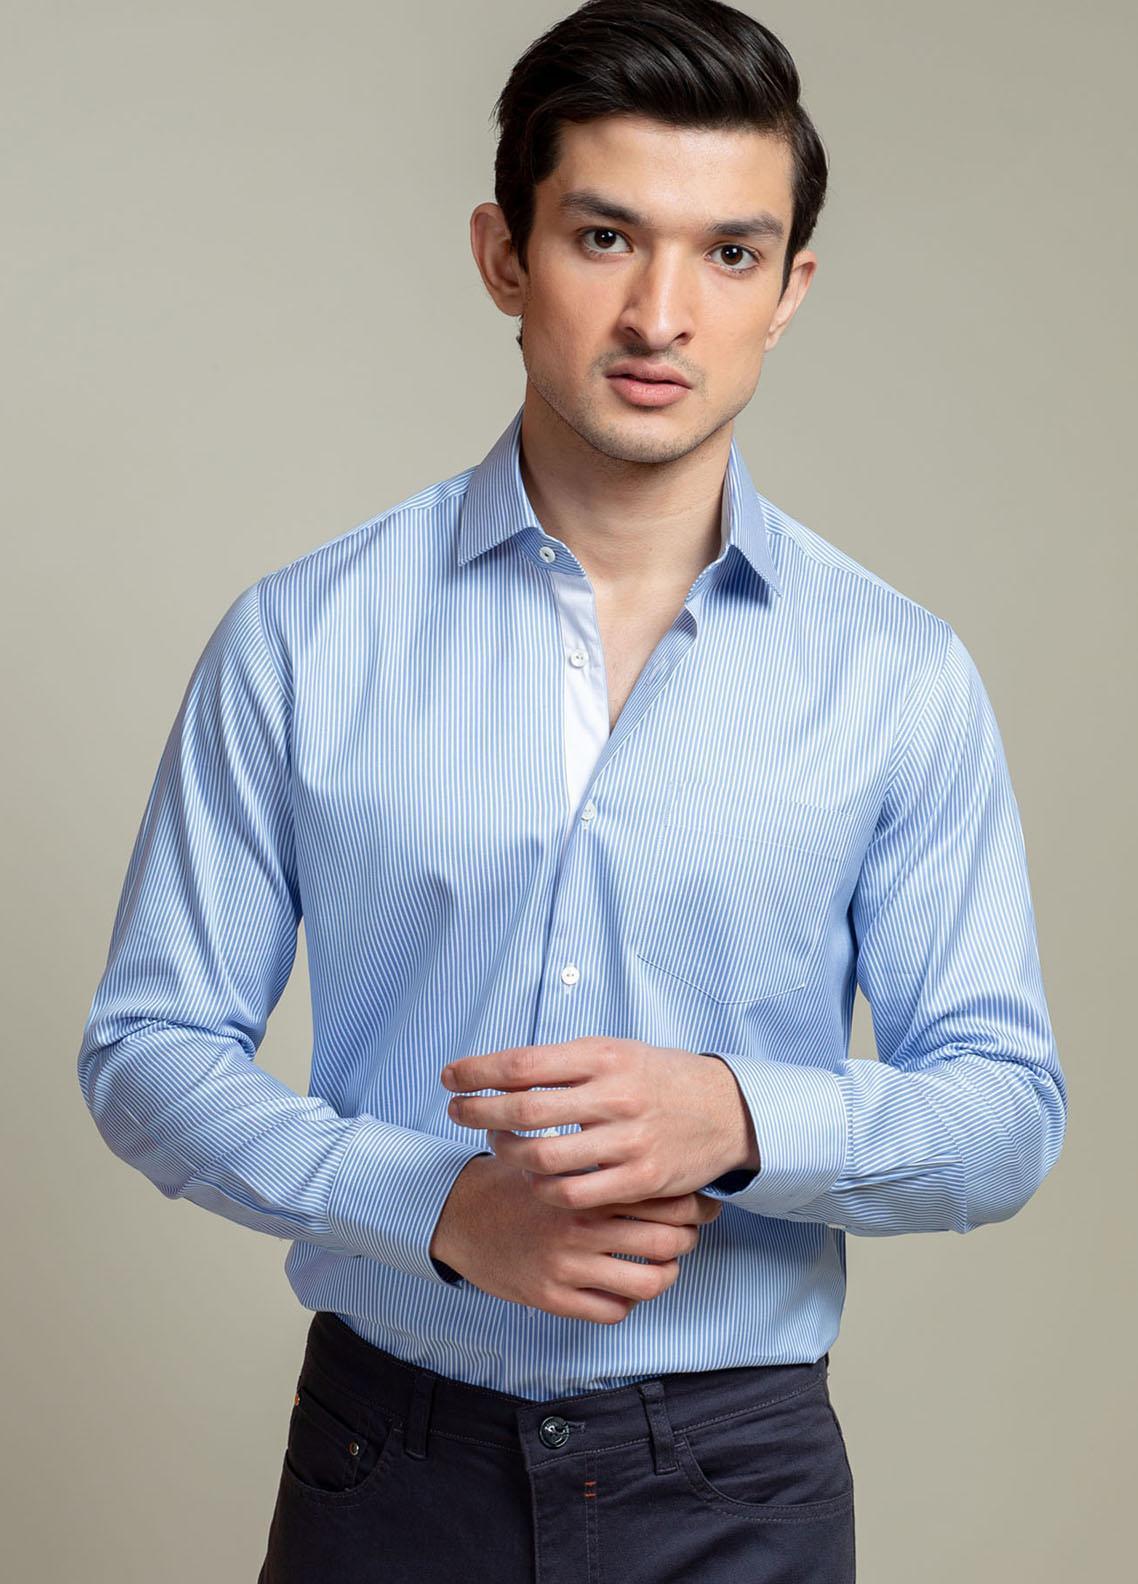 Brumano Cotton Casual Shirts for Men -  BM21SH Blue Striped